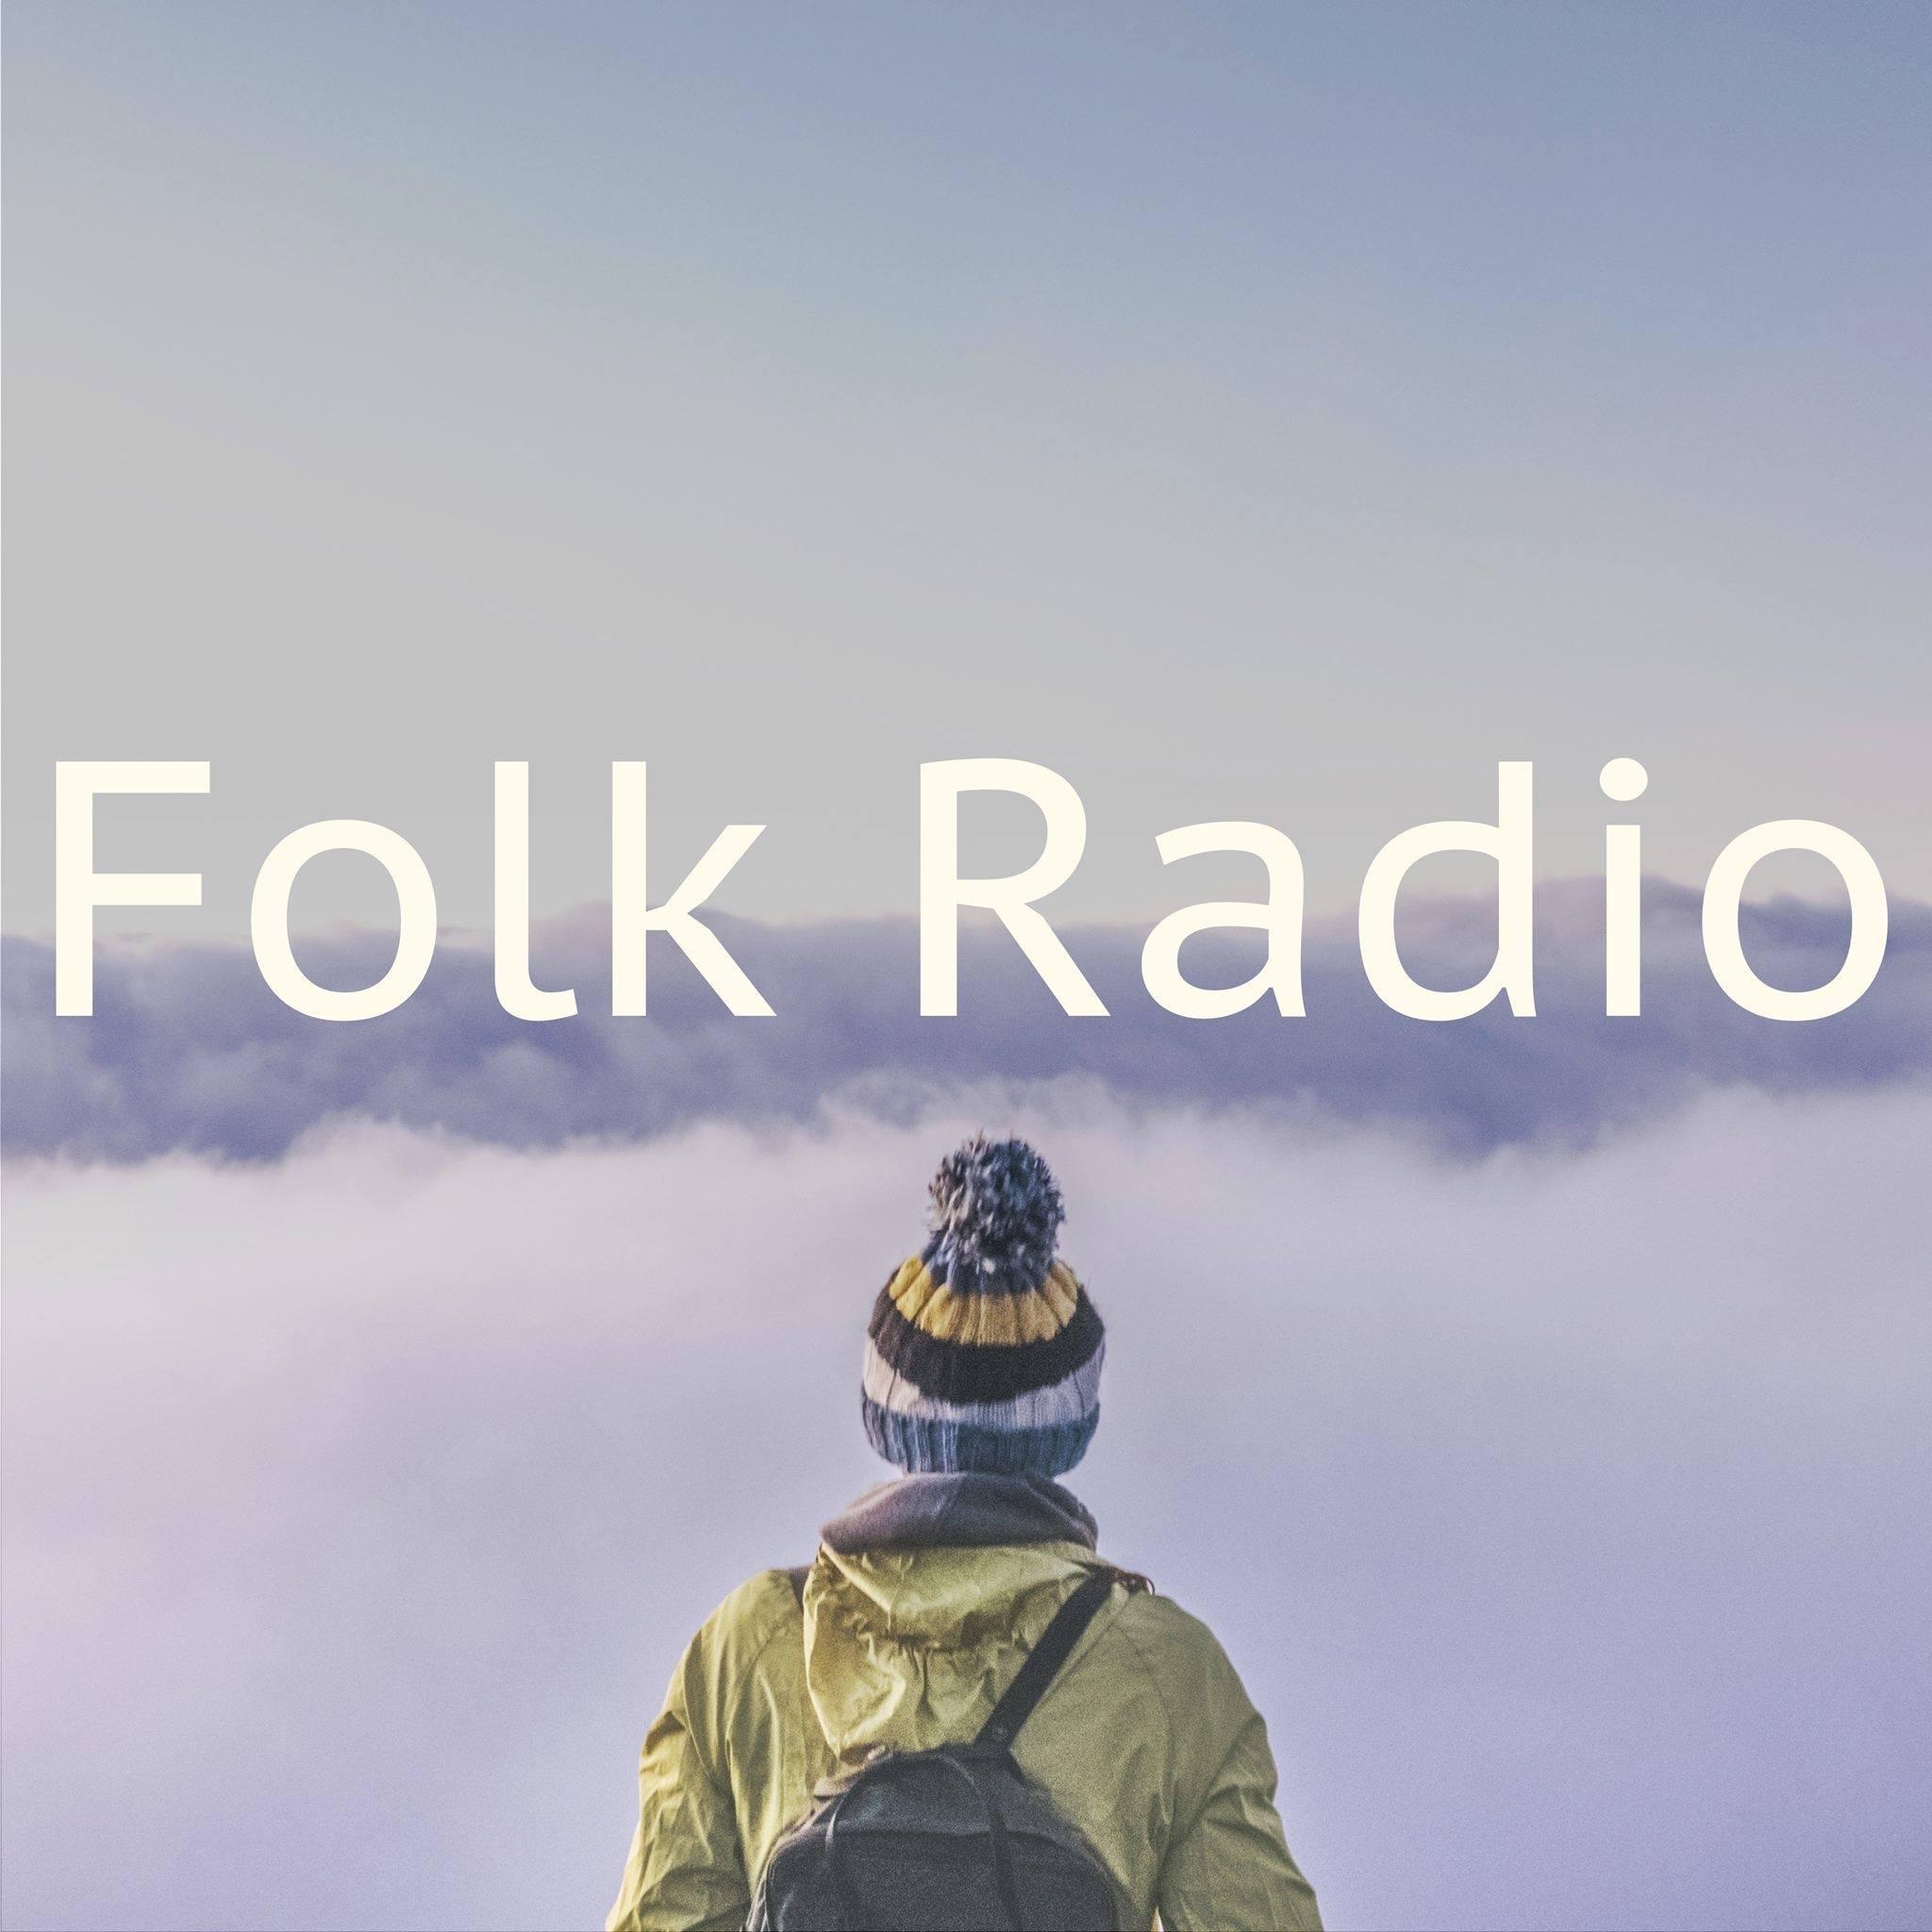 INTERVIEW on FOLK RADIO -